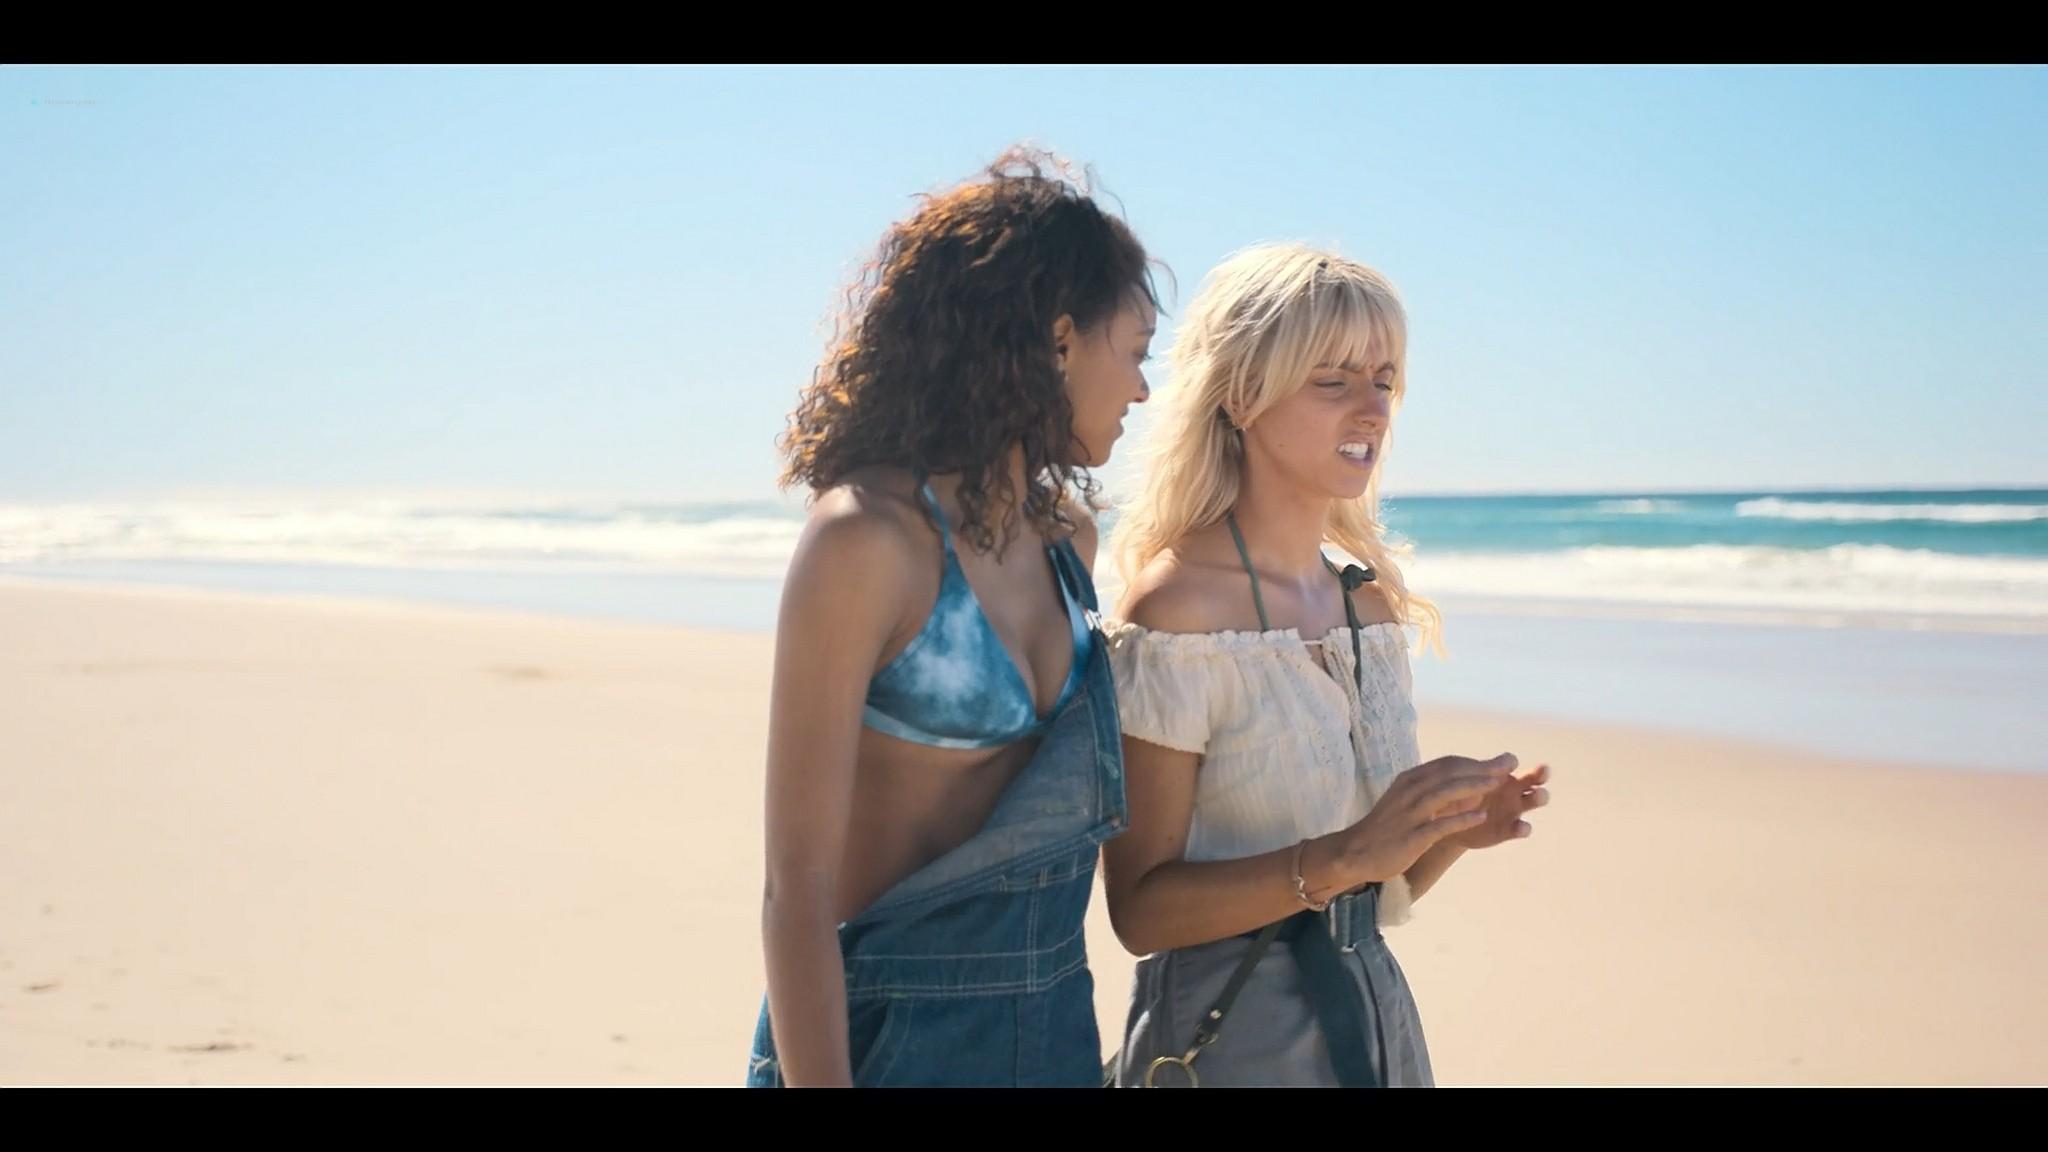 BeBe Bettencourt nude butt Cassandra Sorrell Sophie Wilde nude hot and lesbian sex Eden AU 2021 s1e1 3 1080p Web 5